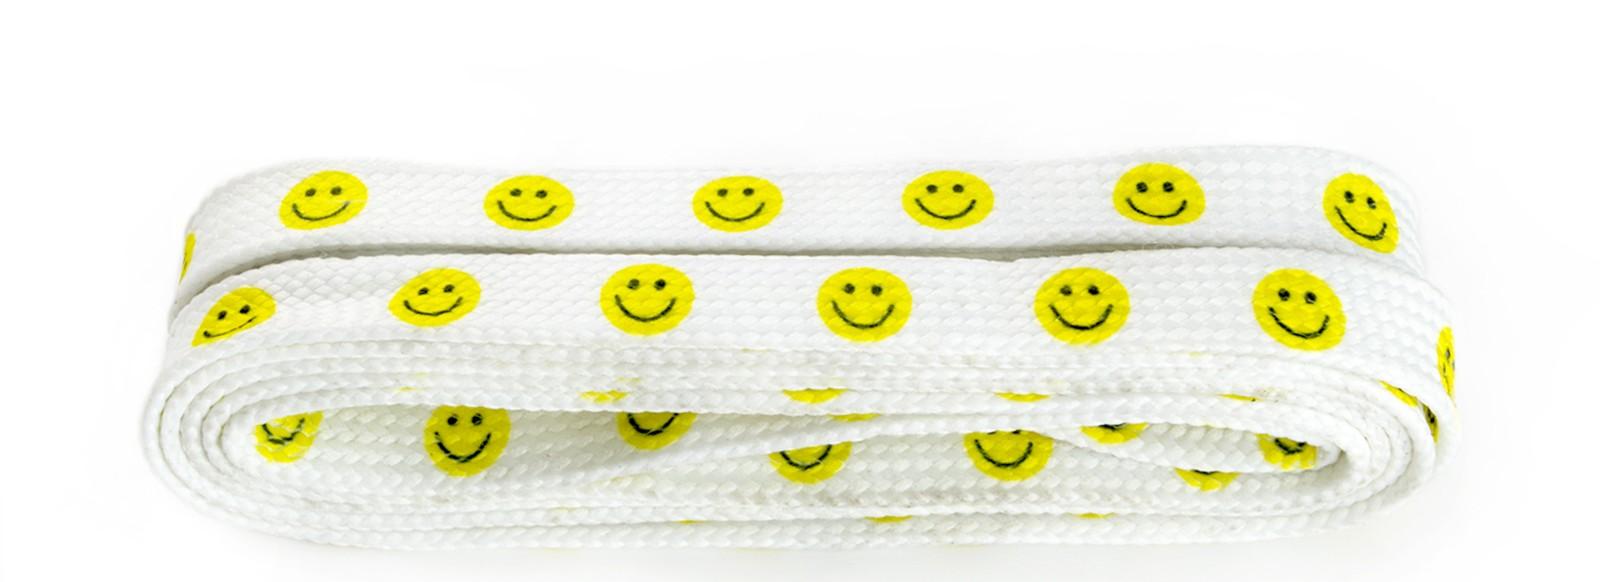 Sneaker White- Yellow Face